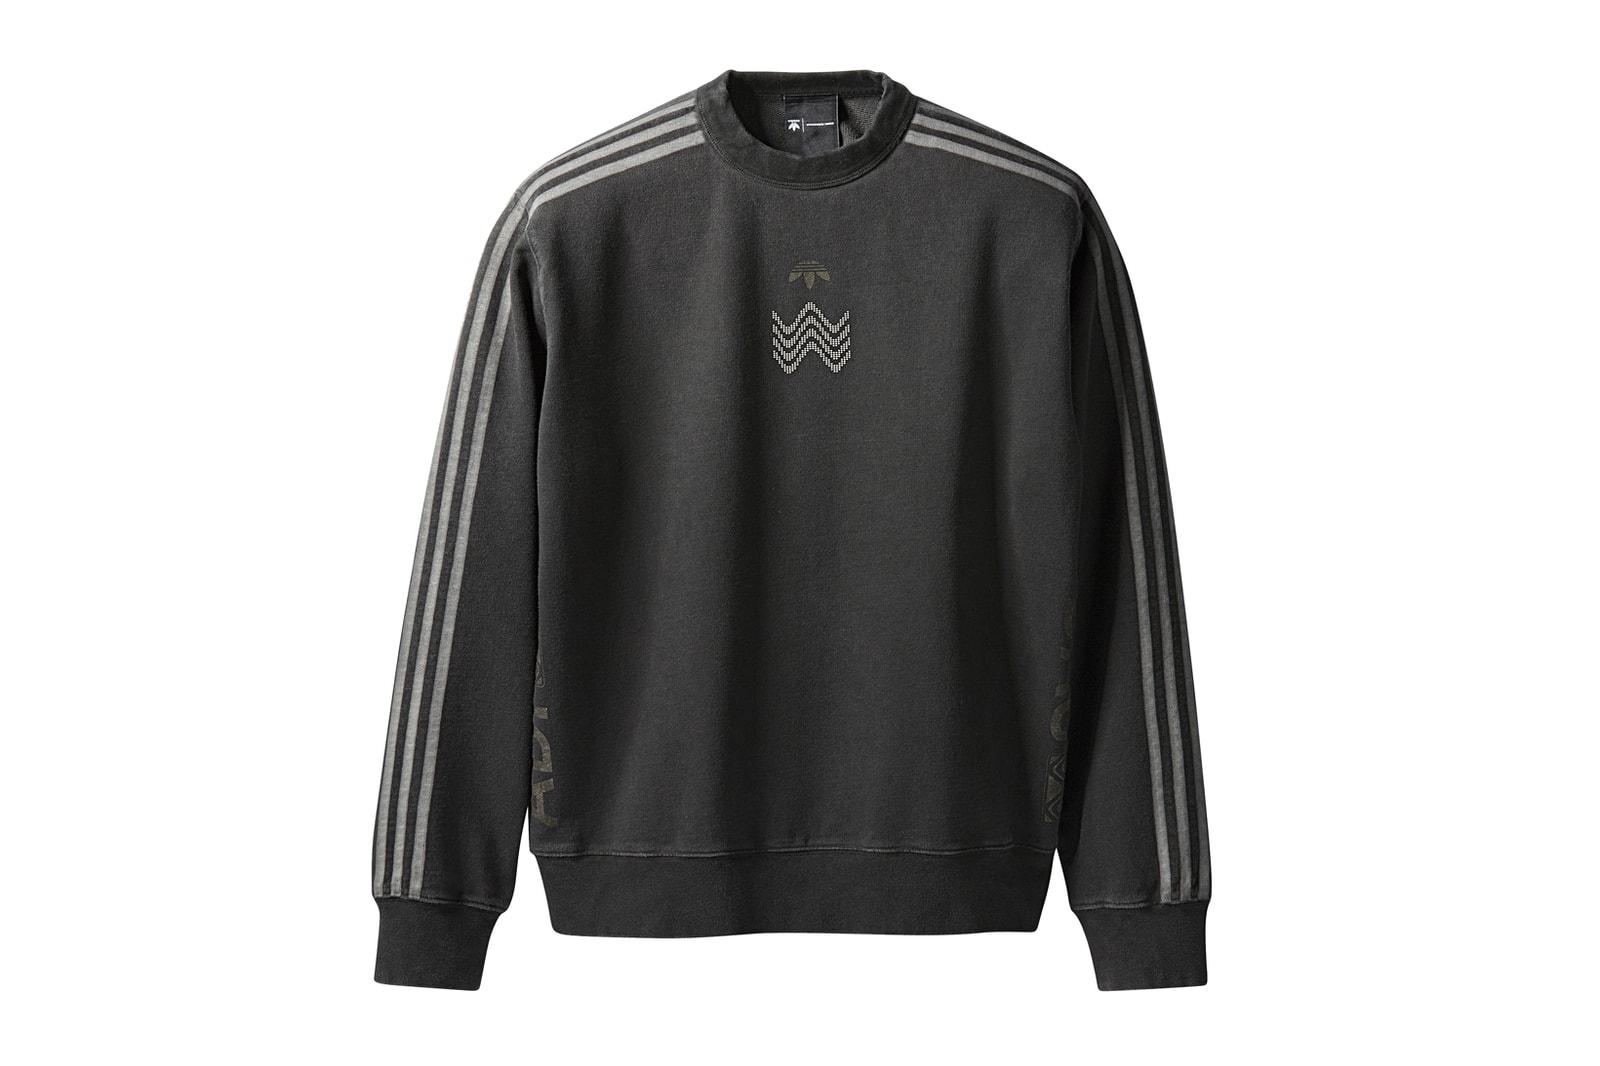 Alexander Wang x adidas Originals Season 2 Collection Campaign